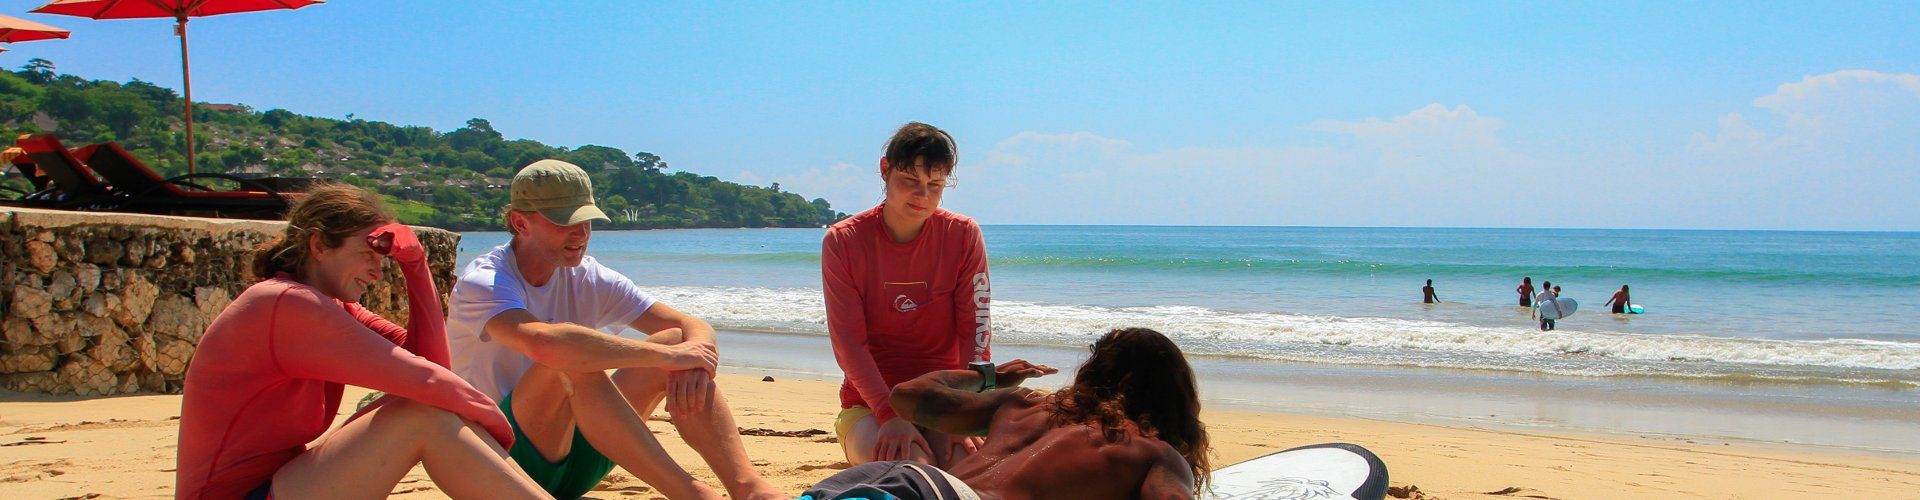 Surf camp Indonesia Bali Canggu